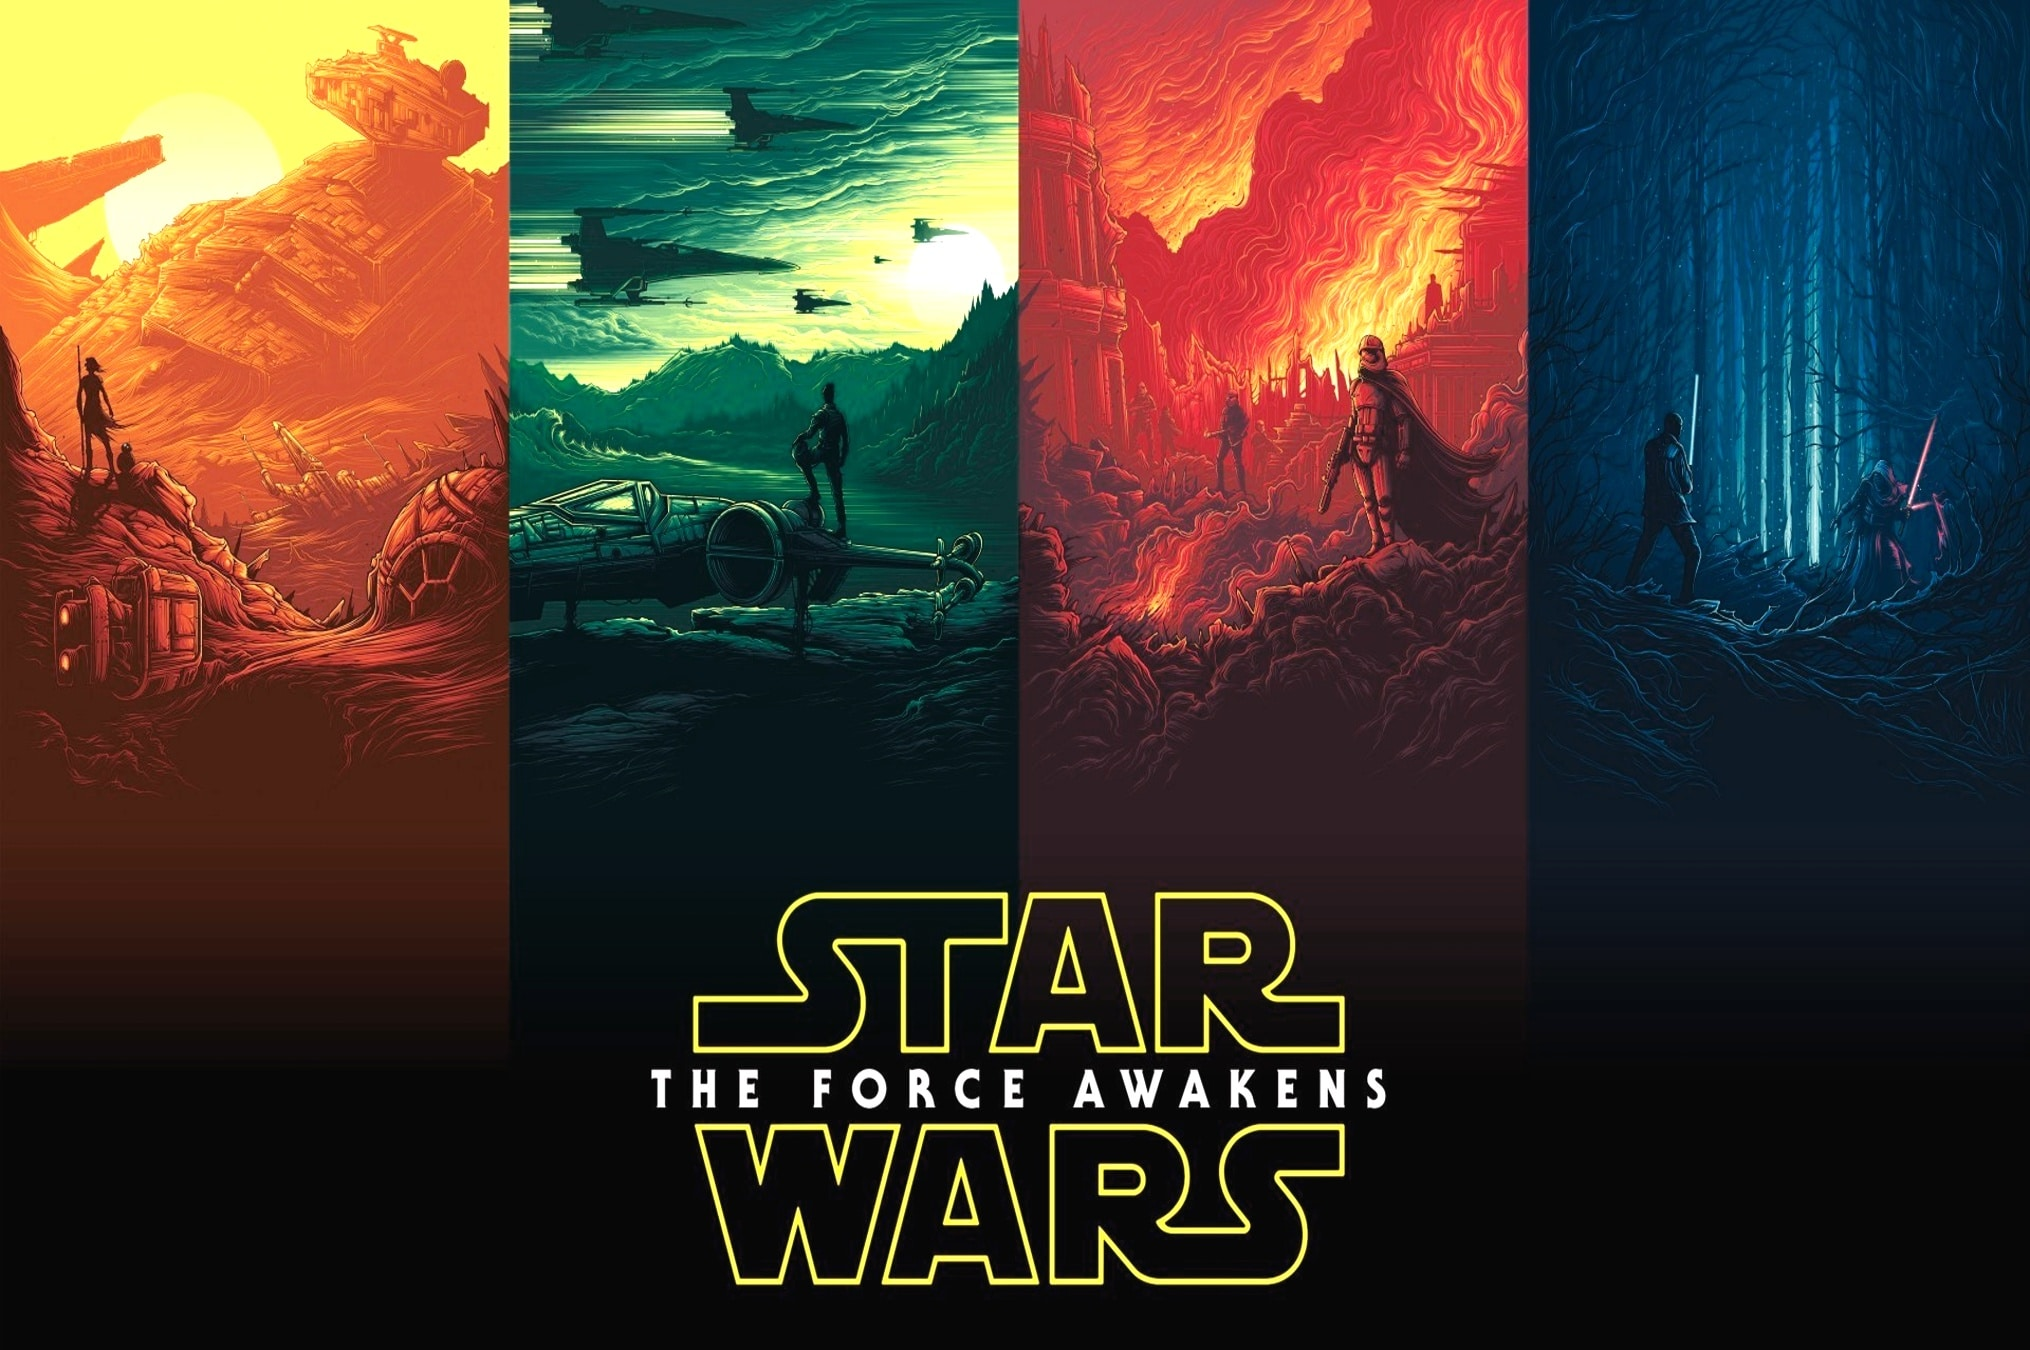 Star Wars Wallpaper Hd Posted By Ryan Mercado